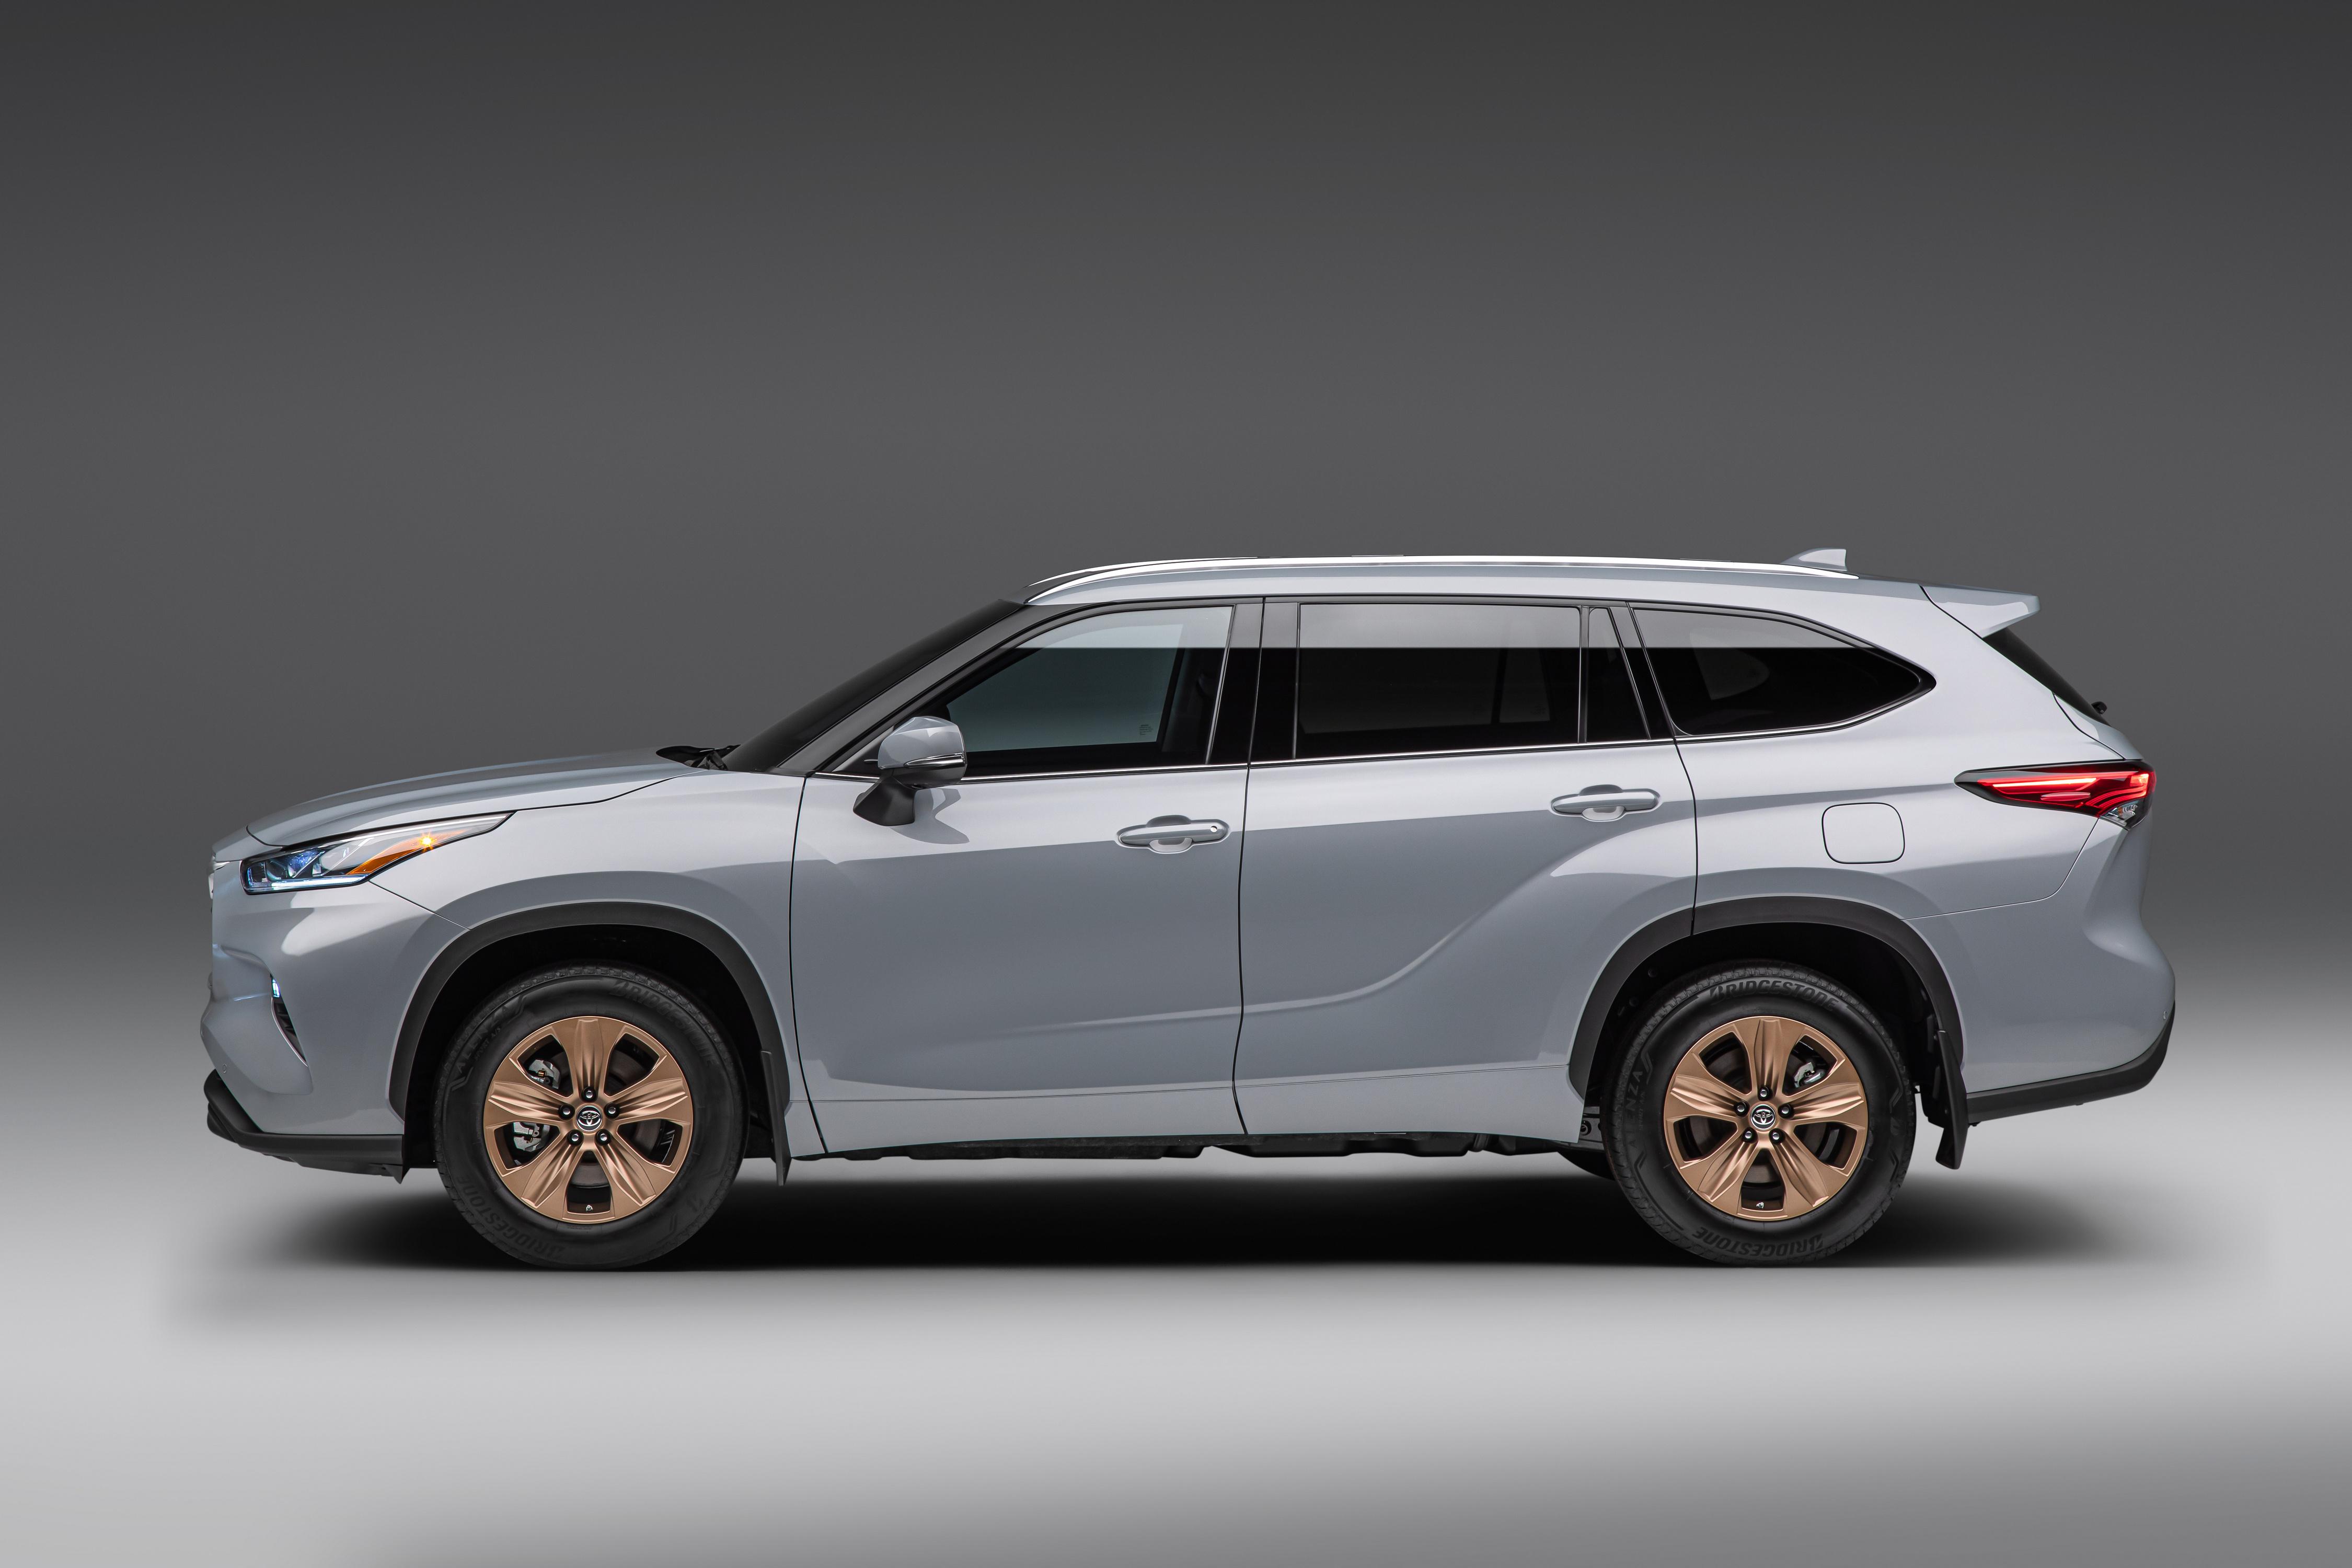 4500x3000,丰田汽车,Highlander XLE 'Bronze Edition', (North America), 2021,灰色,金屬漆,側視圖,汽车,